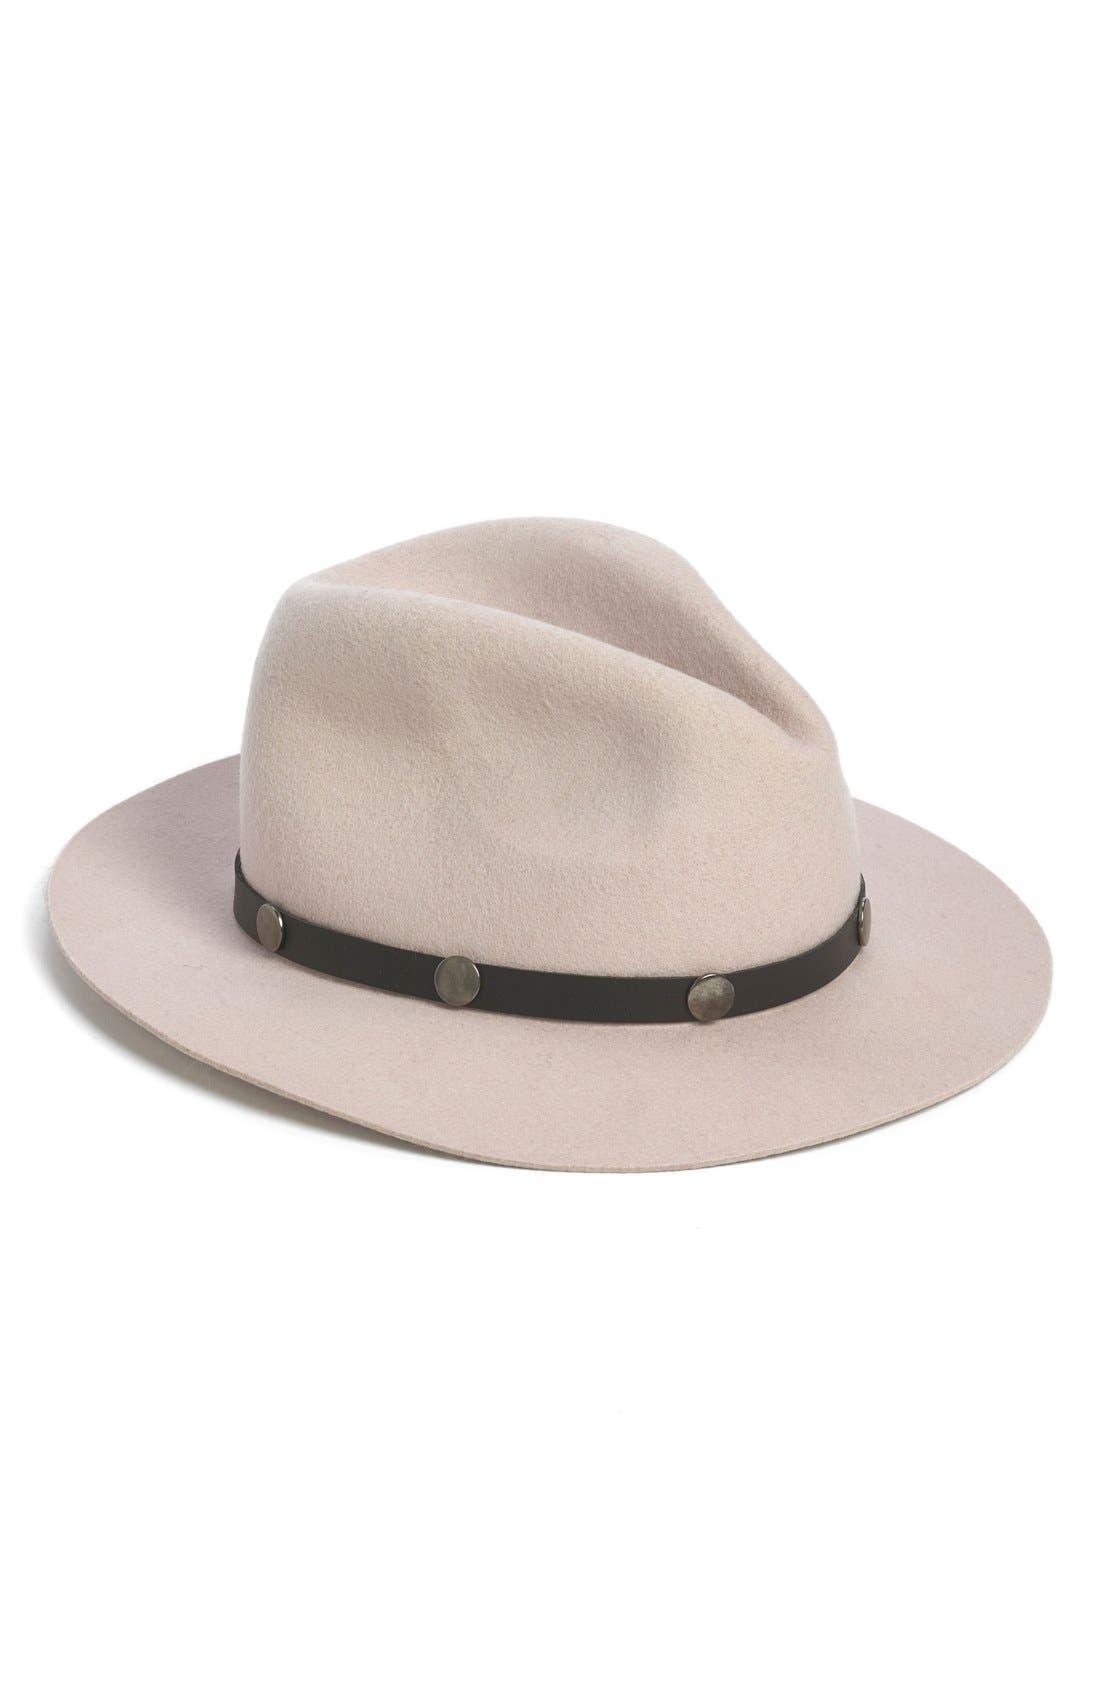 Alternate Image 1 Selected - BP. Studded Felt Panama Hat (Juniors)